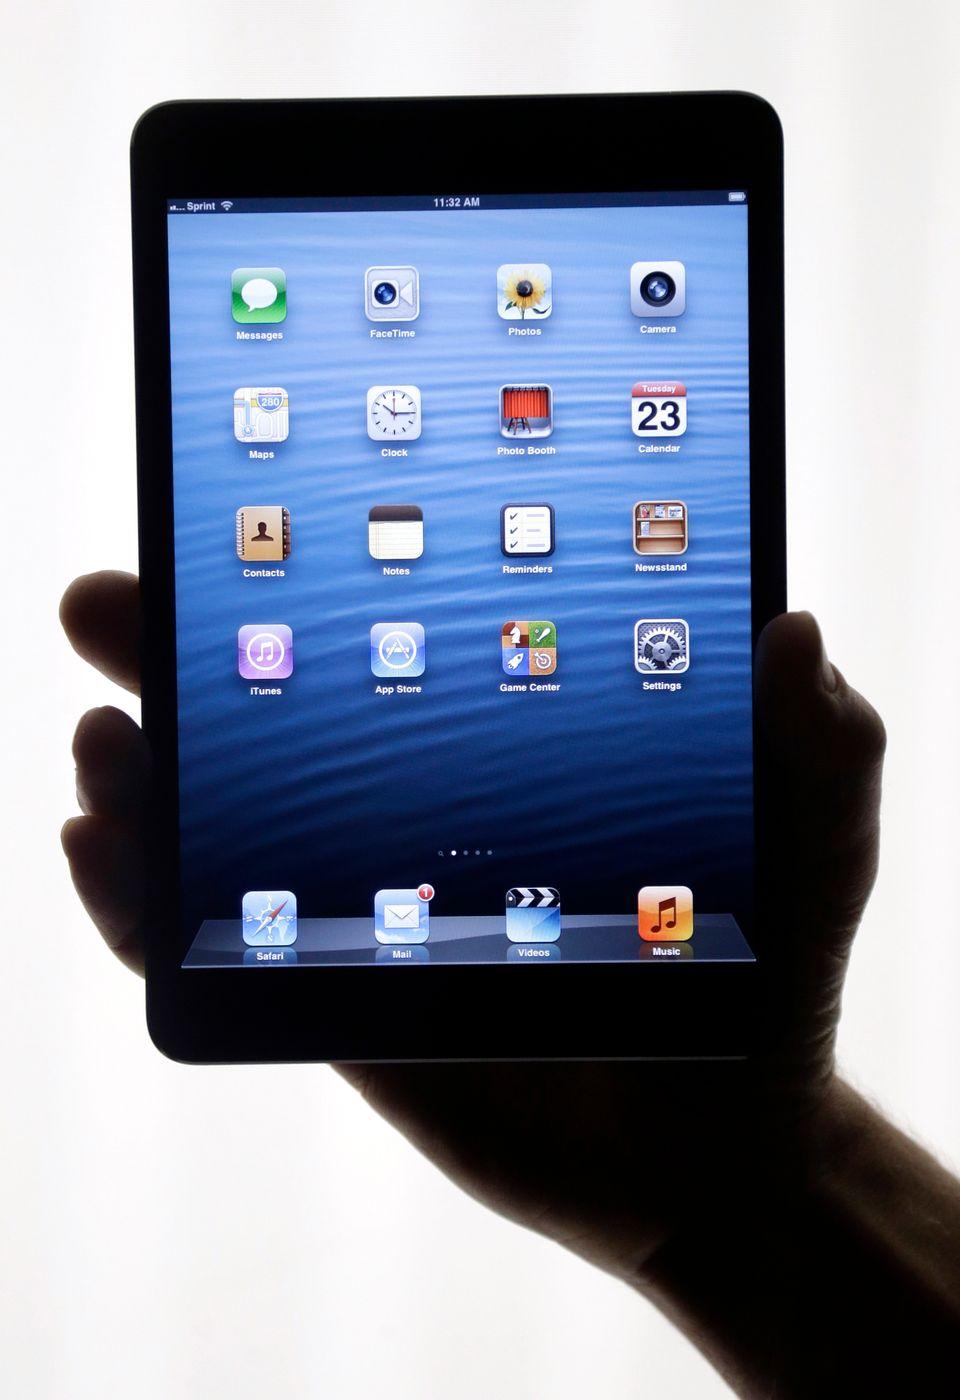 "<a href=""http://www.usatoday.com/story/tech/columnist/baig/2012/10/30/baig-review-apple-ipad-mini/1668737/"">USA Today's Edwar"